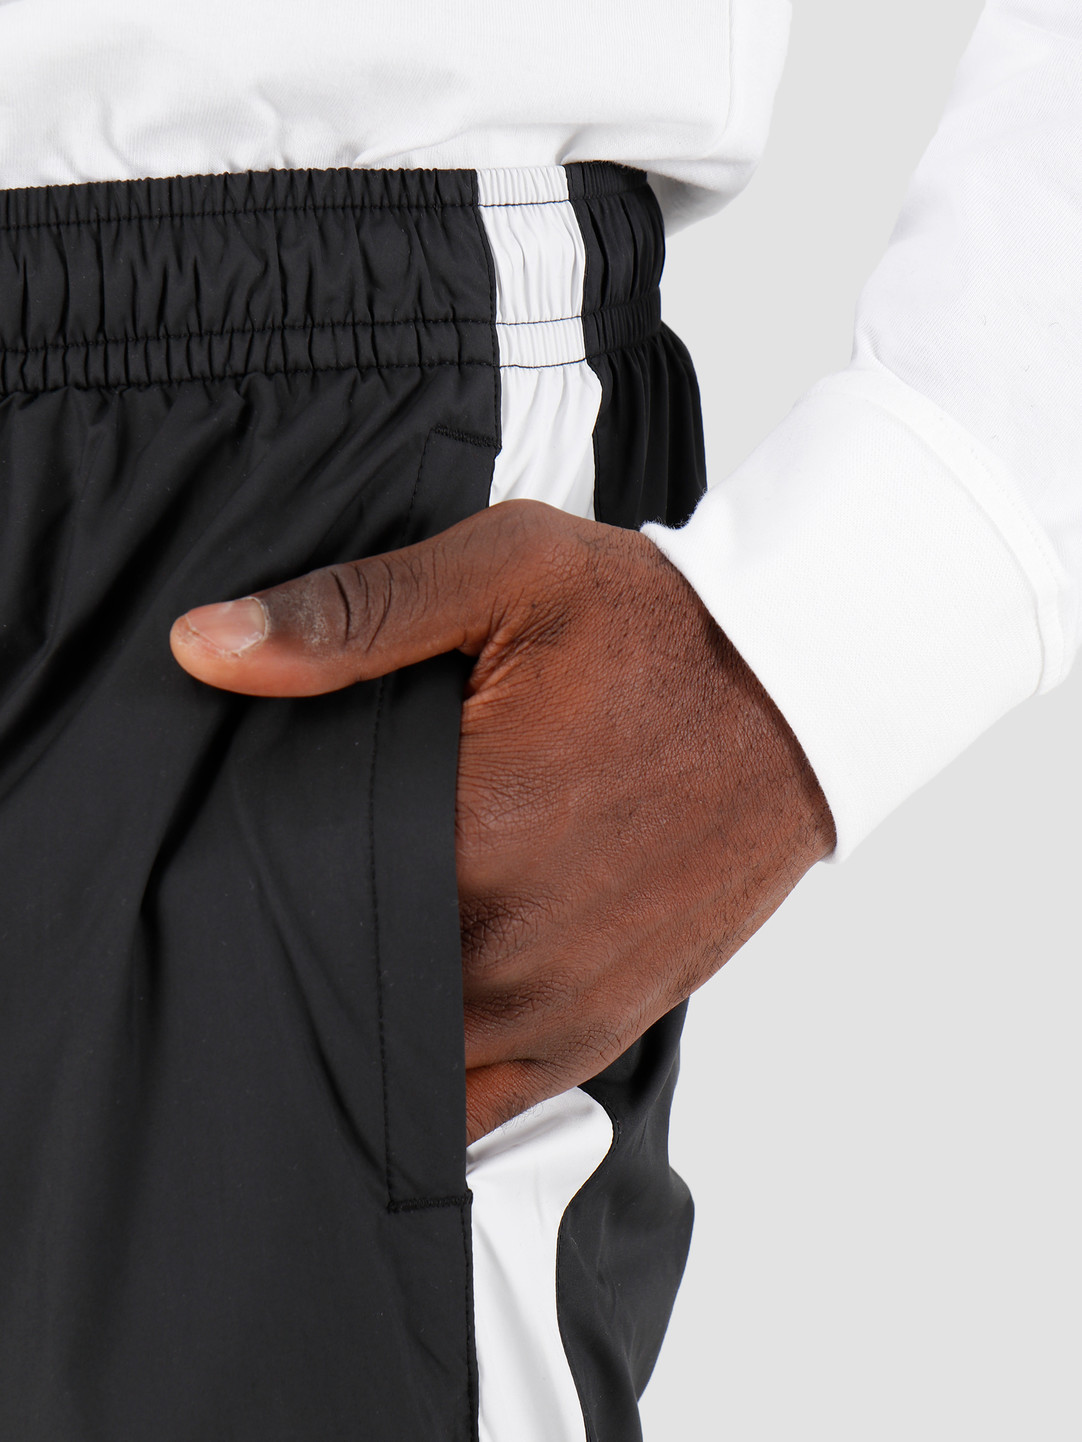 Nike Nike SB Shield Pants Black White White Ci1990-010